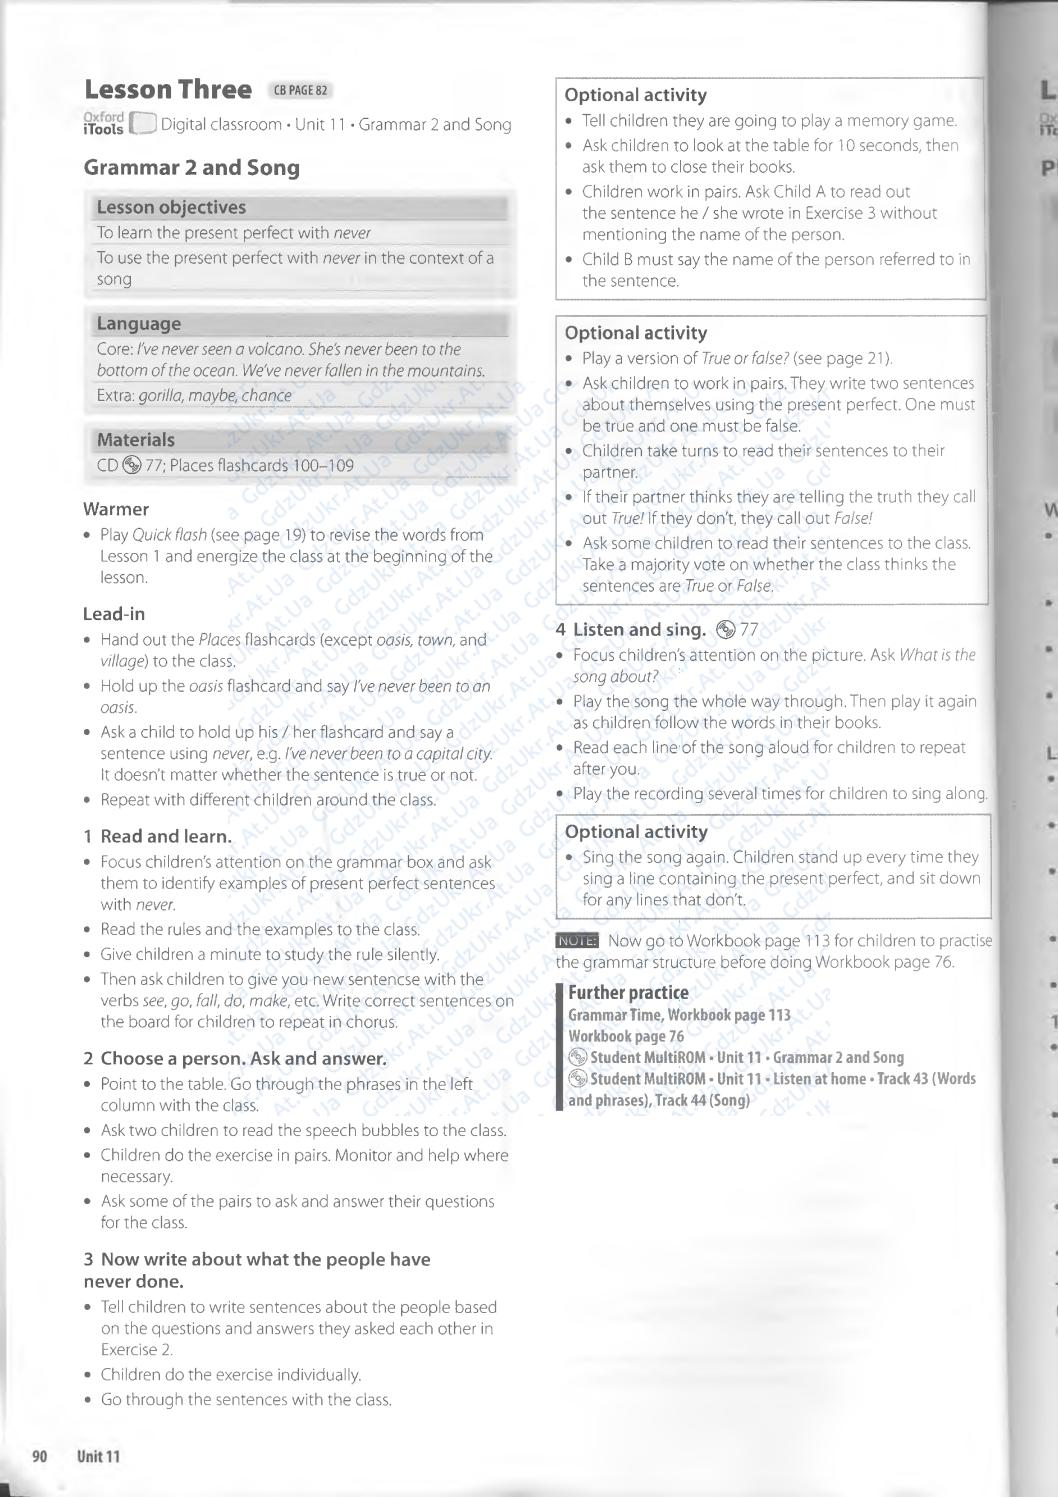 Adobe Photoshop 7.0 - Free Download Full